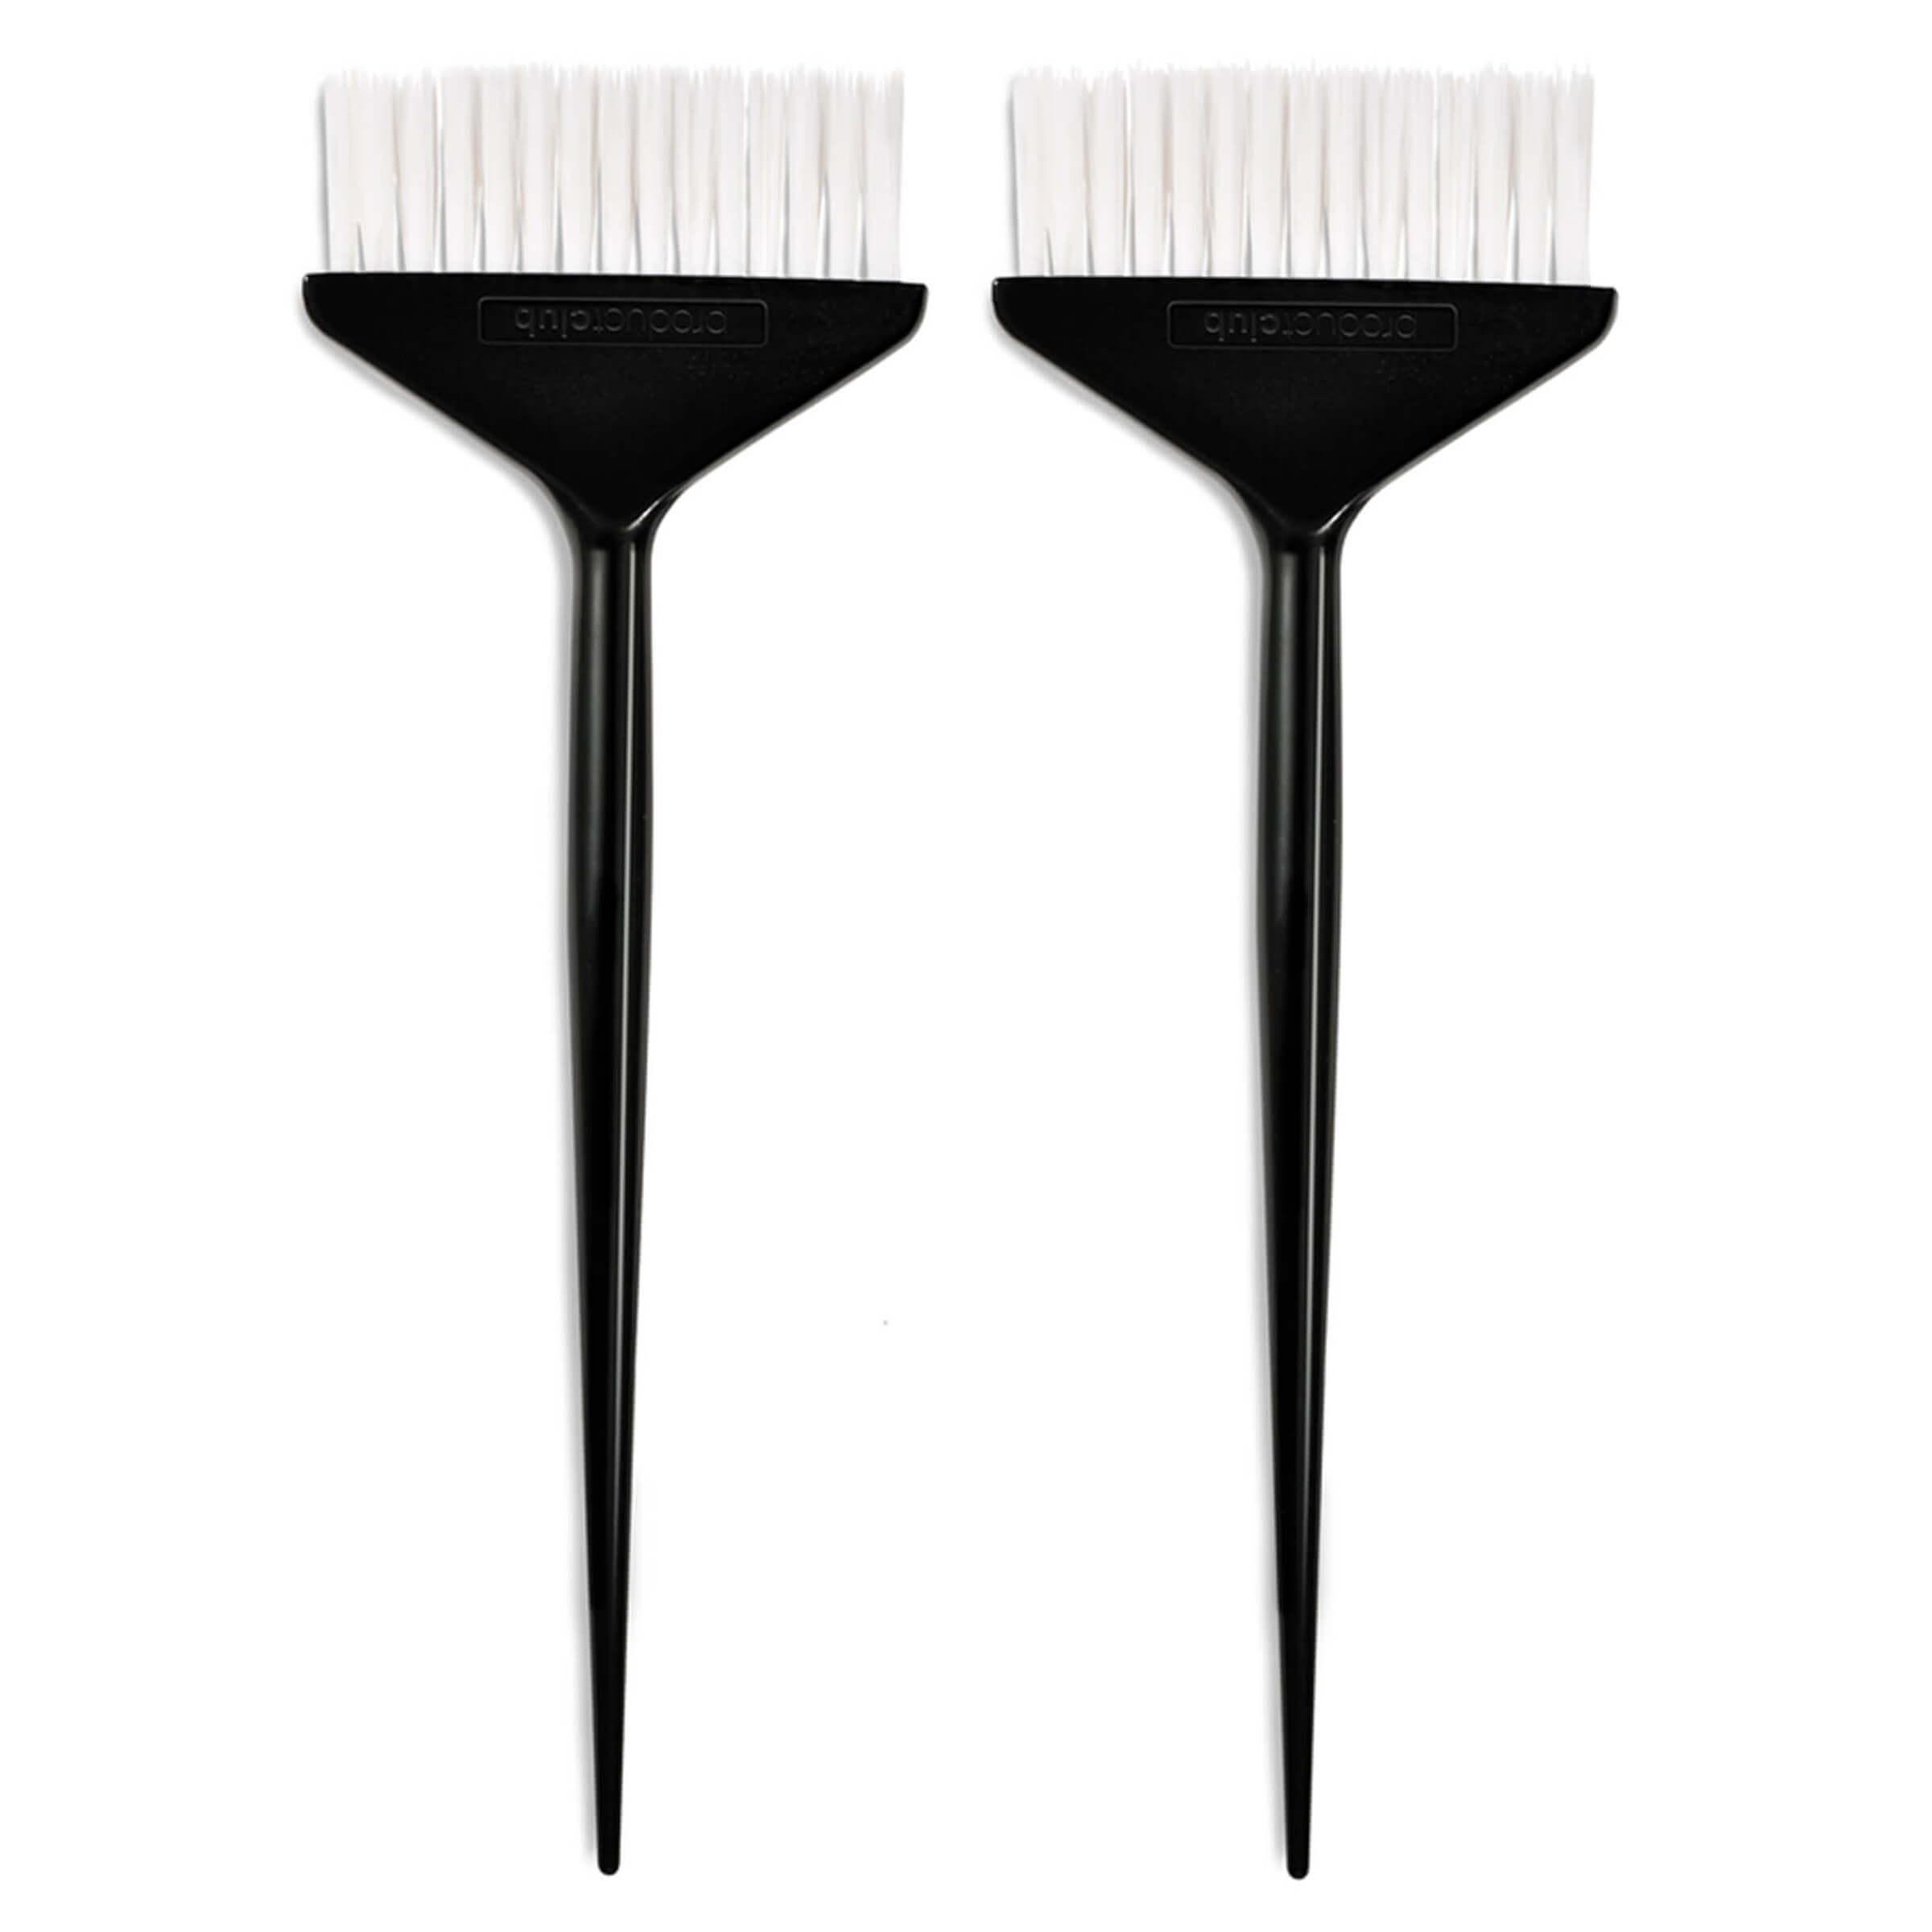 EWCB-2 Extra Wide Hair Dye Brush Root Tap